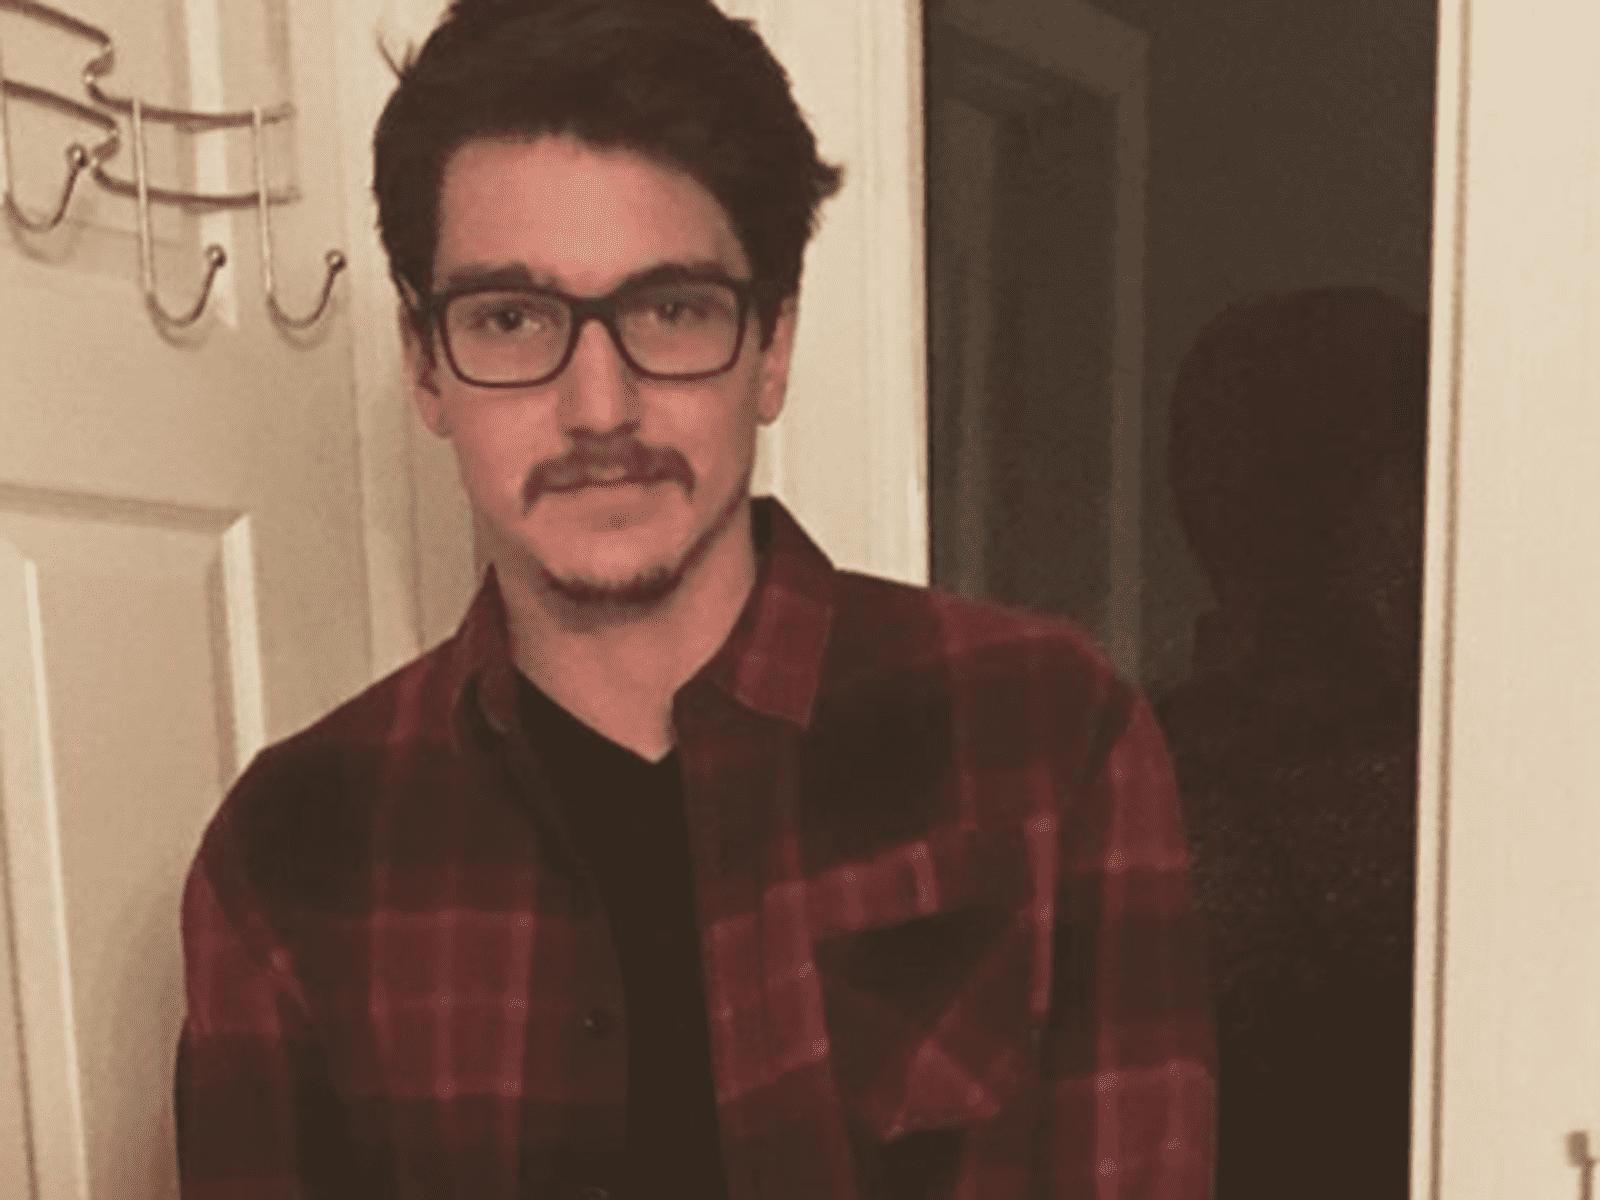 Dominic from Ottawa, Ontario, Canada